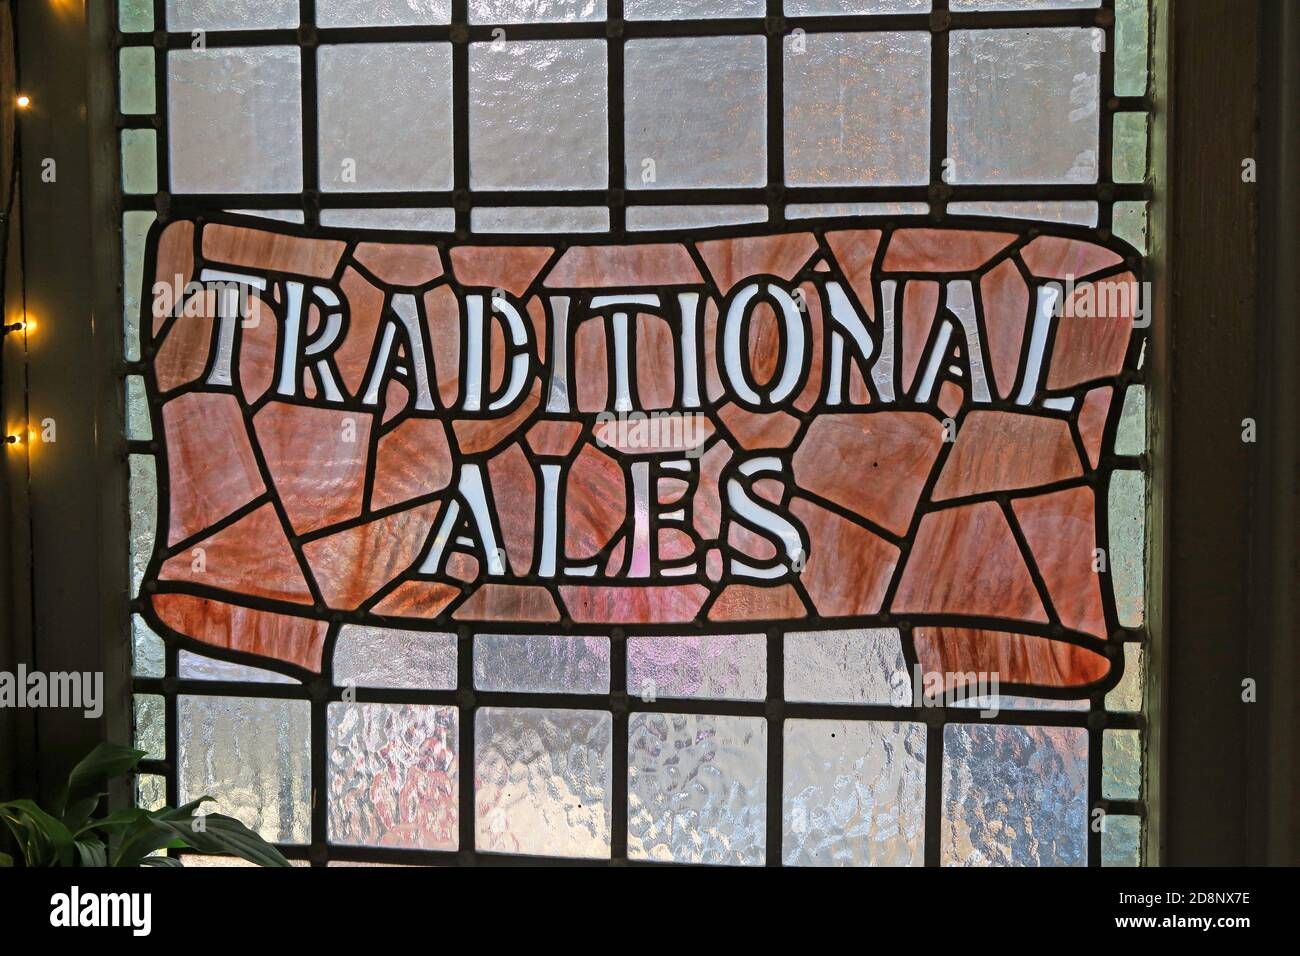 HotpixUK,@HotpixUK,GoTonySmith,UK,England,Great Britain,GB,Nottingham city centre,Notts,Nottinghamshire,bar,pub,in a bar/pub,beers,Great British,Traditional pub,Nottingham,city centre,The old castle inn